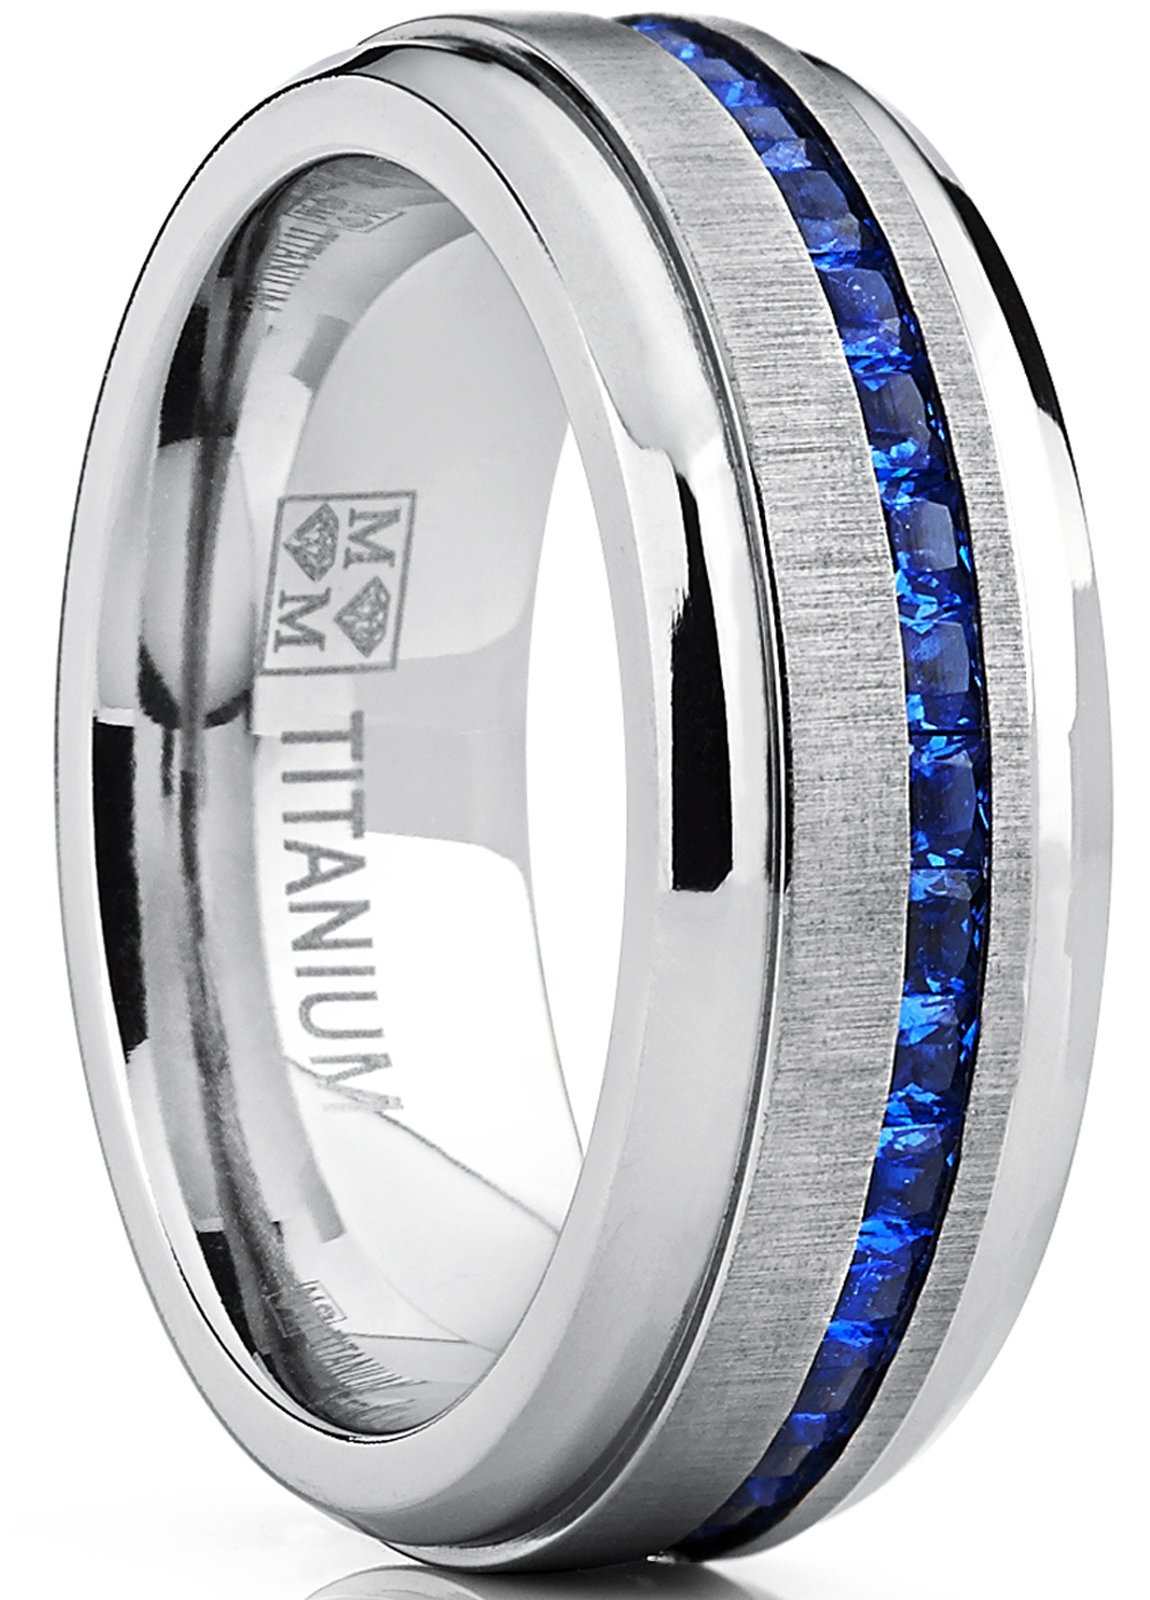 Metal Masters Co. Men's Titanium Wedding Band Engagement Ring W/Blue Simulated Sapphire Cubic Zirconia Princess CZ 10